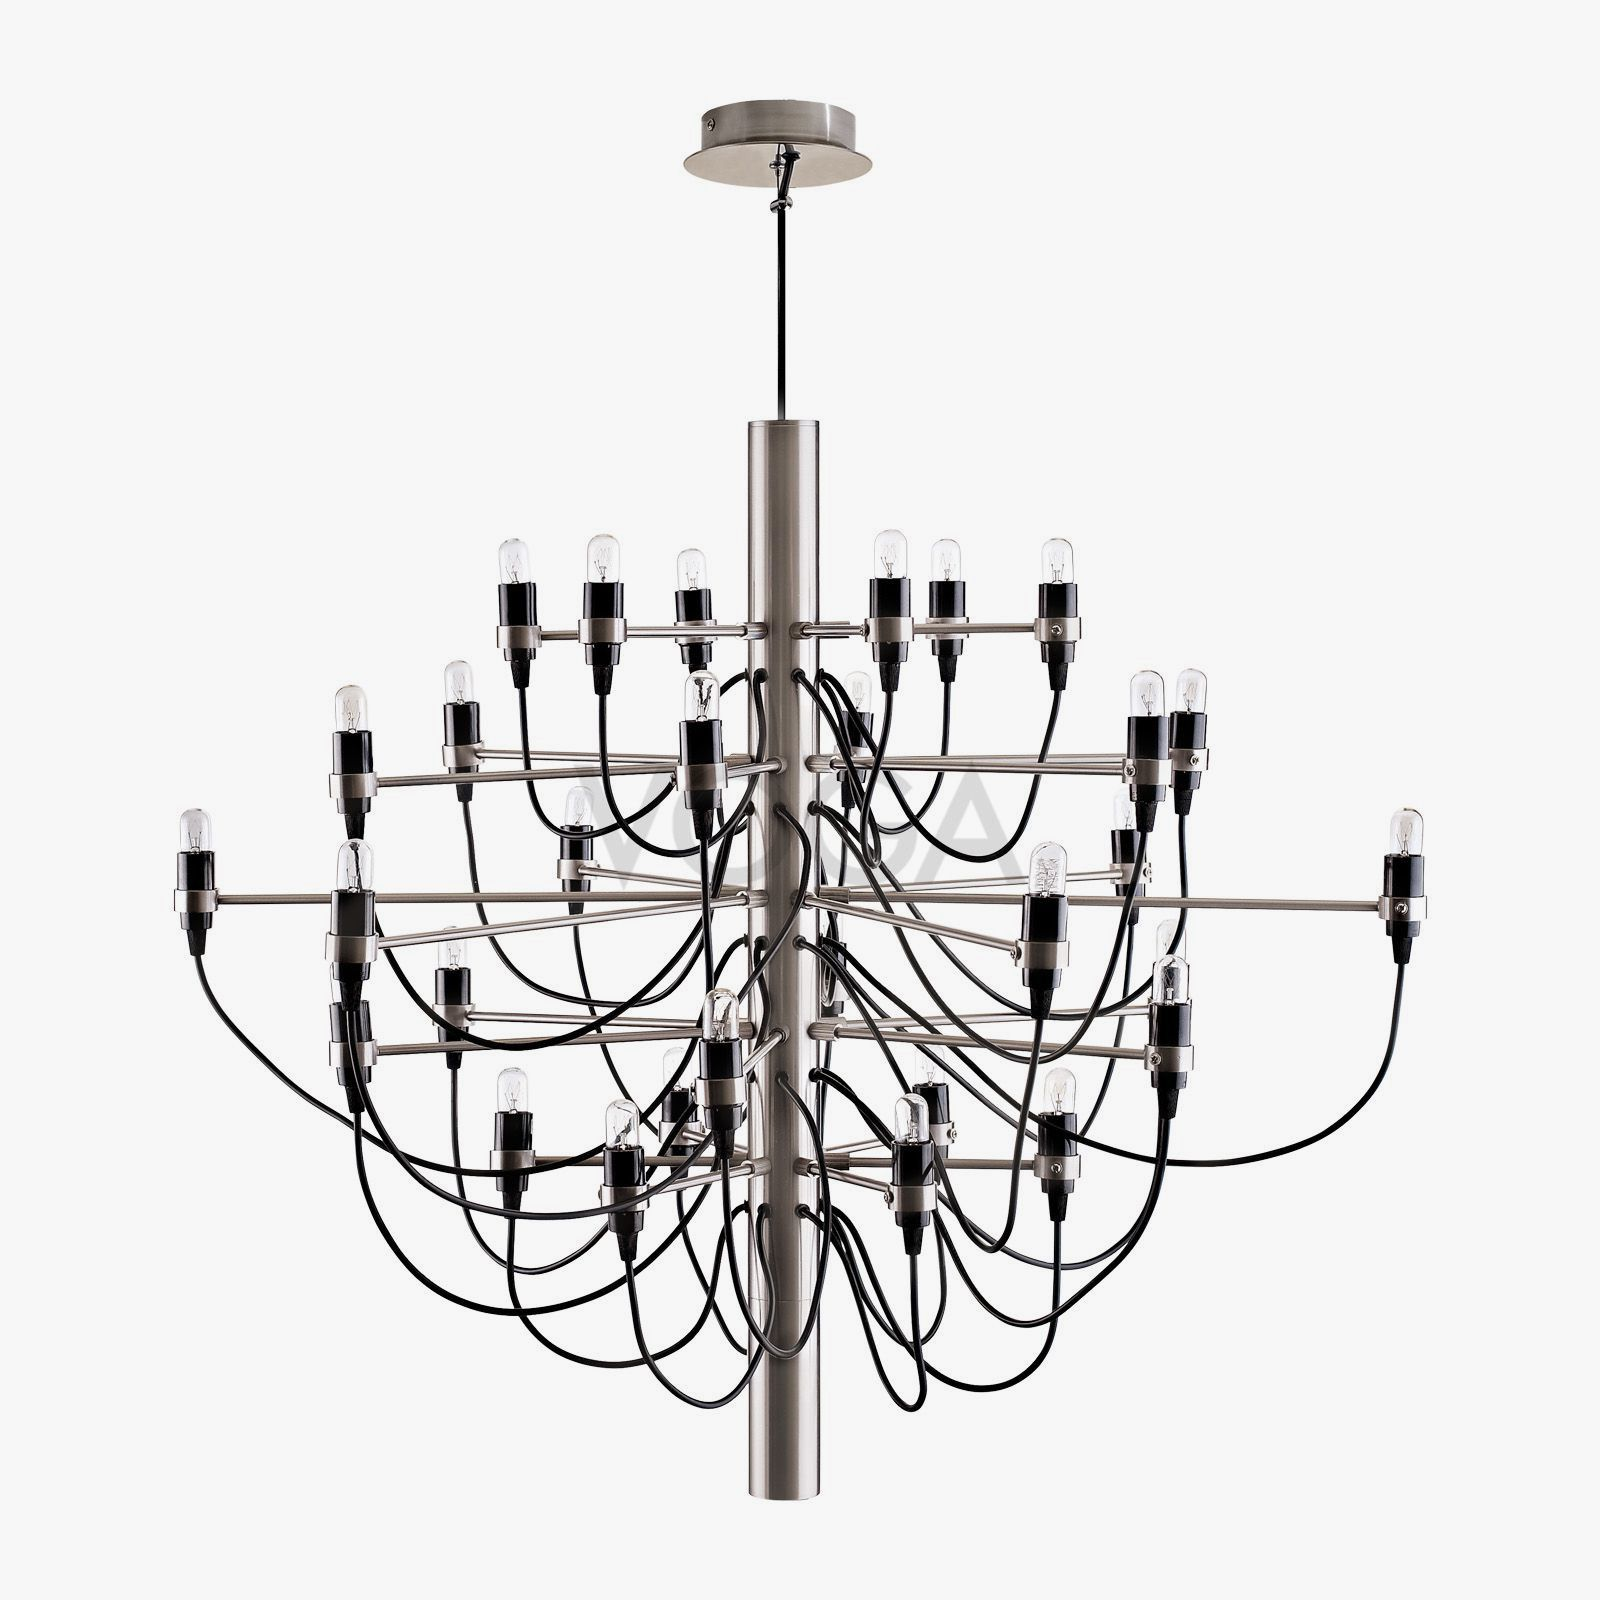 Gino Sarfatti Chandelier Designer Lamps Voga